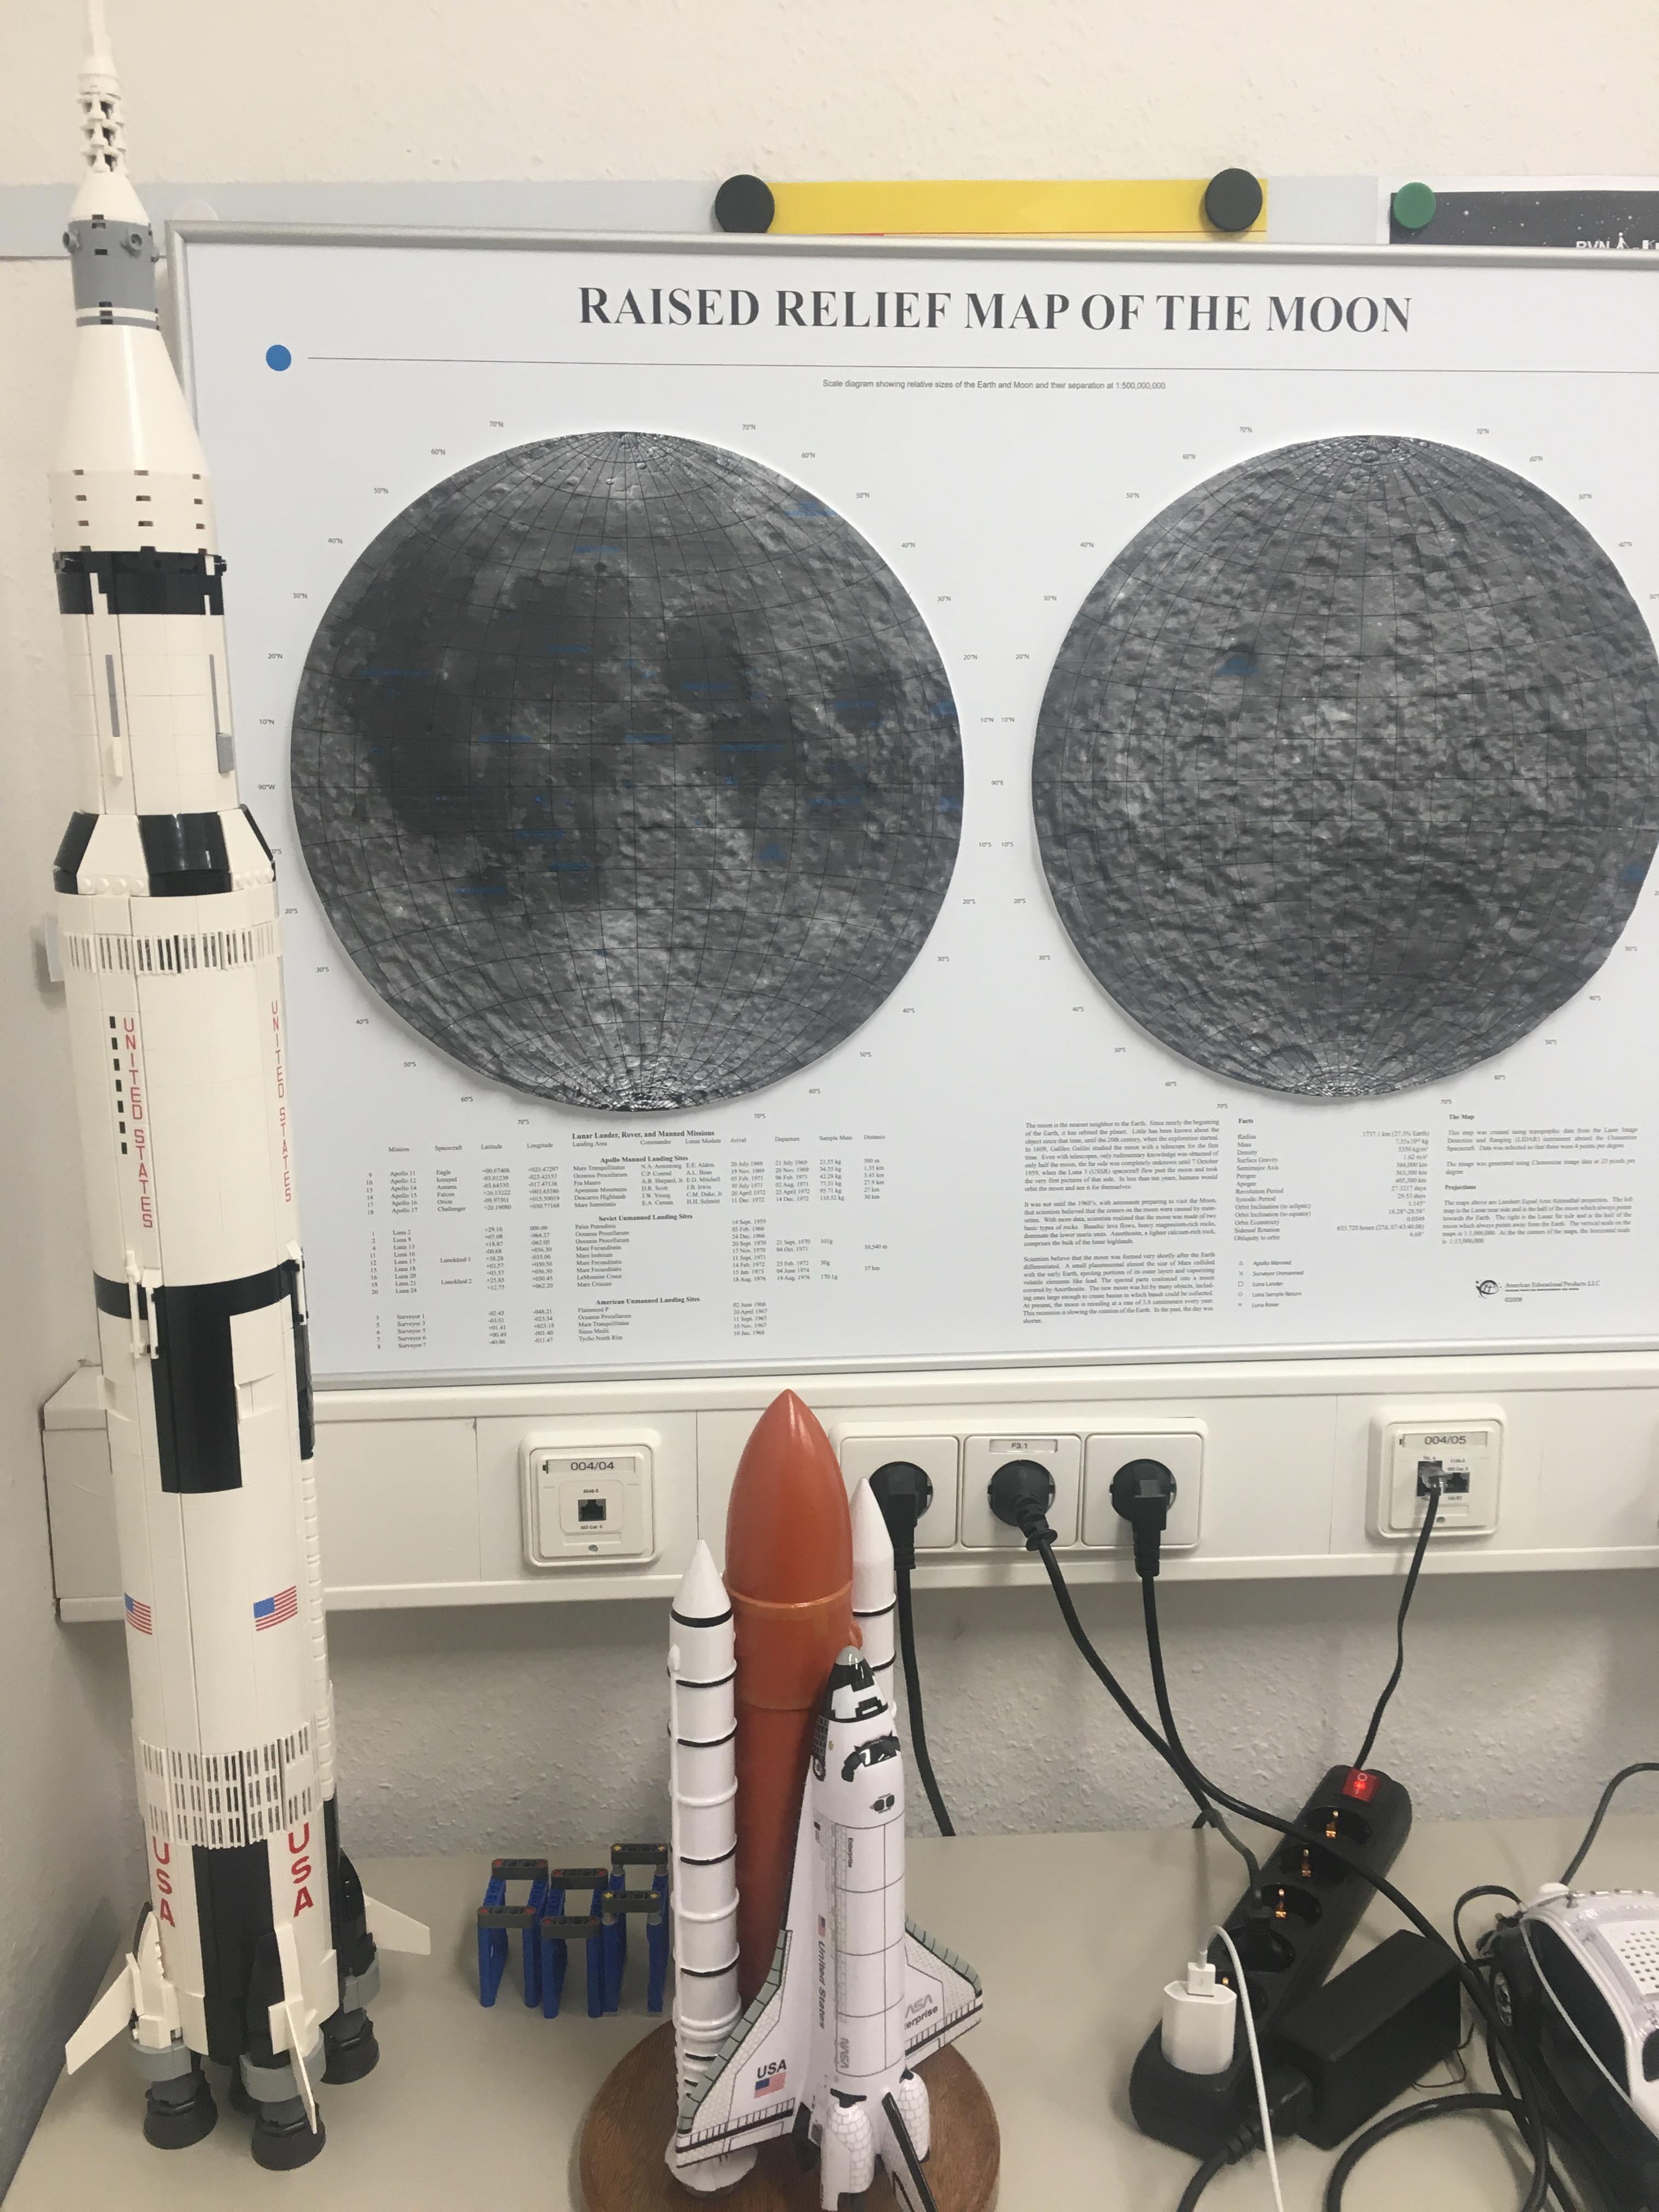 mondkarte hochkant mit Rakete